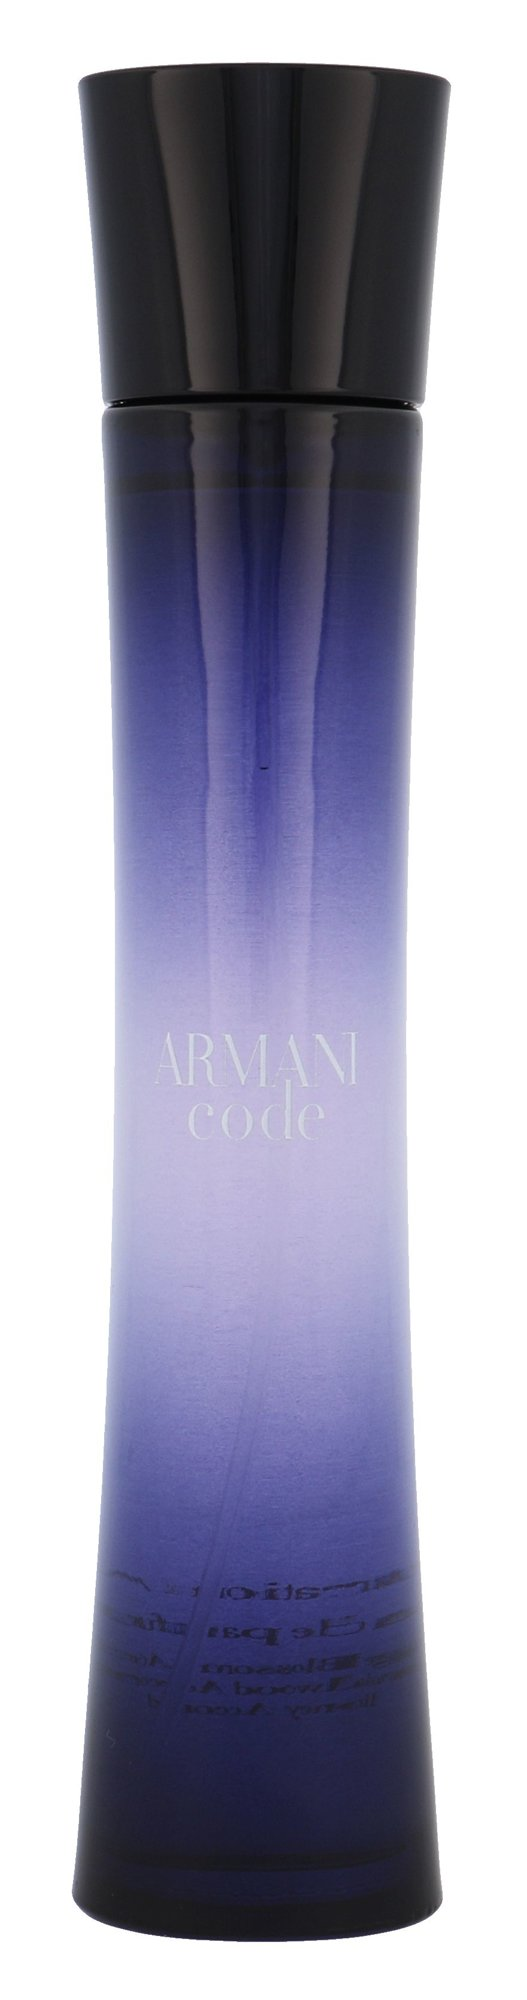 Giorgio Armani Armani Code Women EDP 75ml